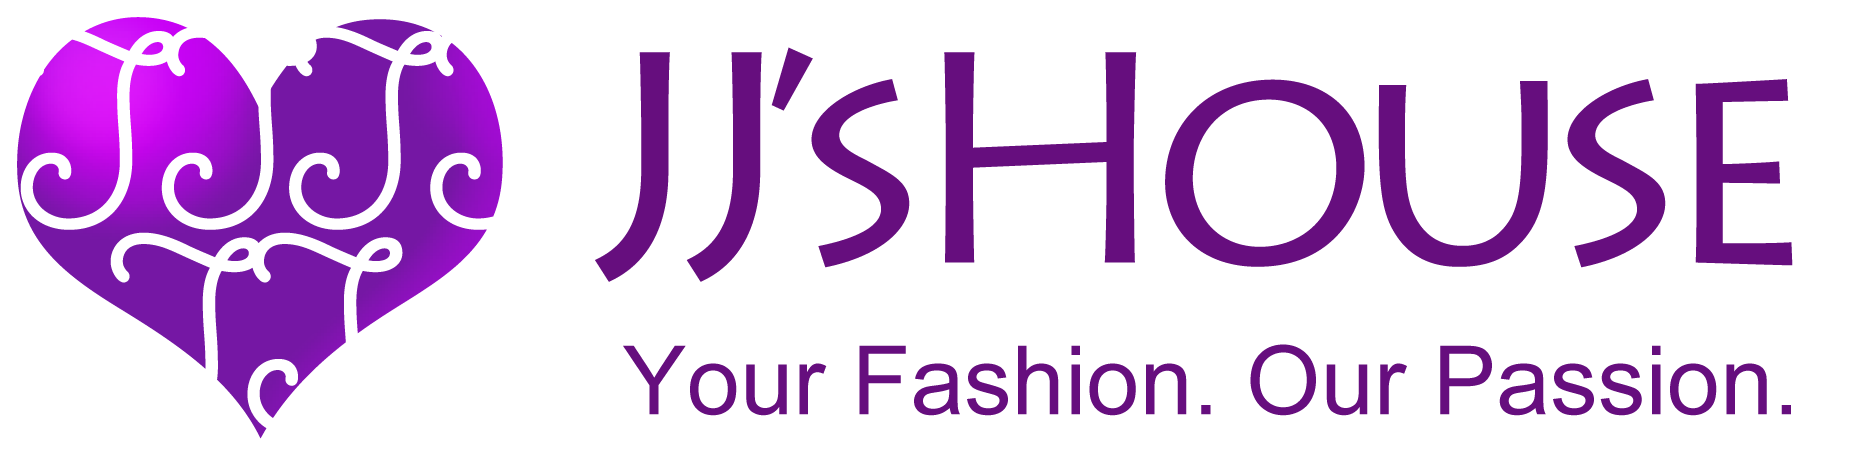 Znalezione obrazy dla zapytania jjshouse logo